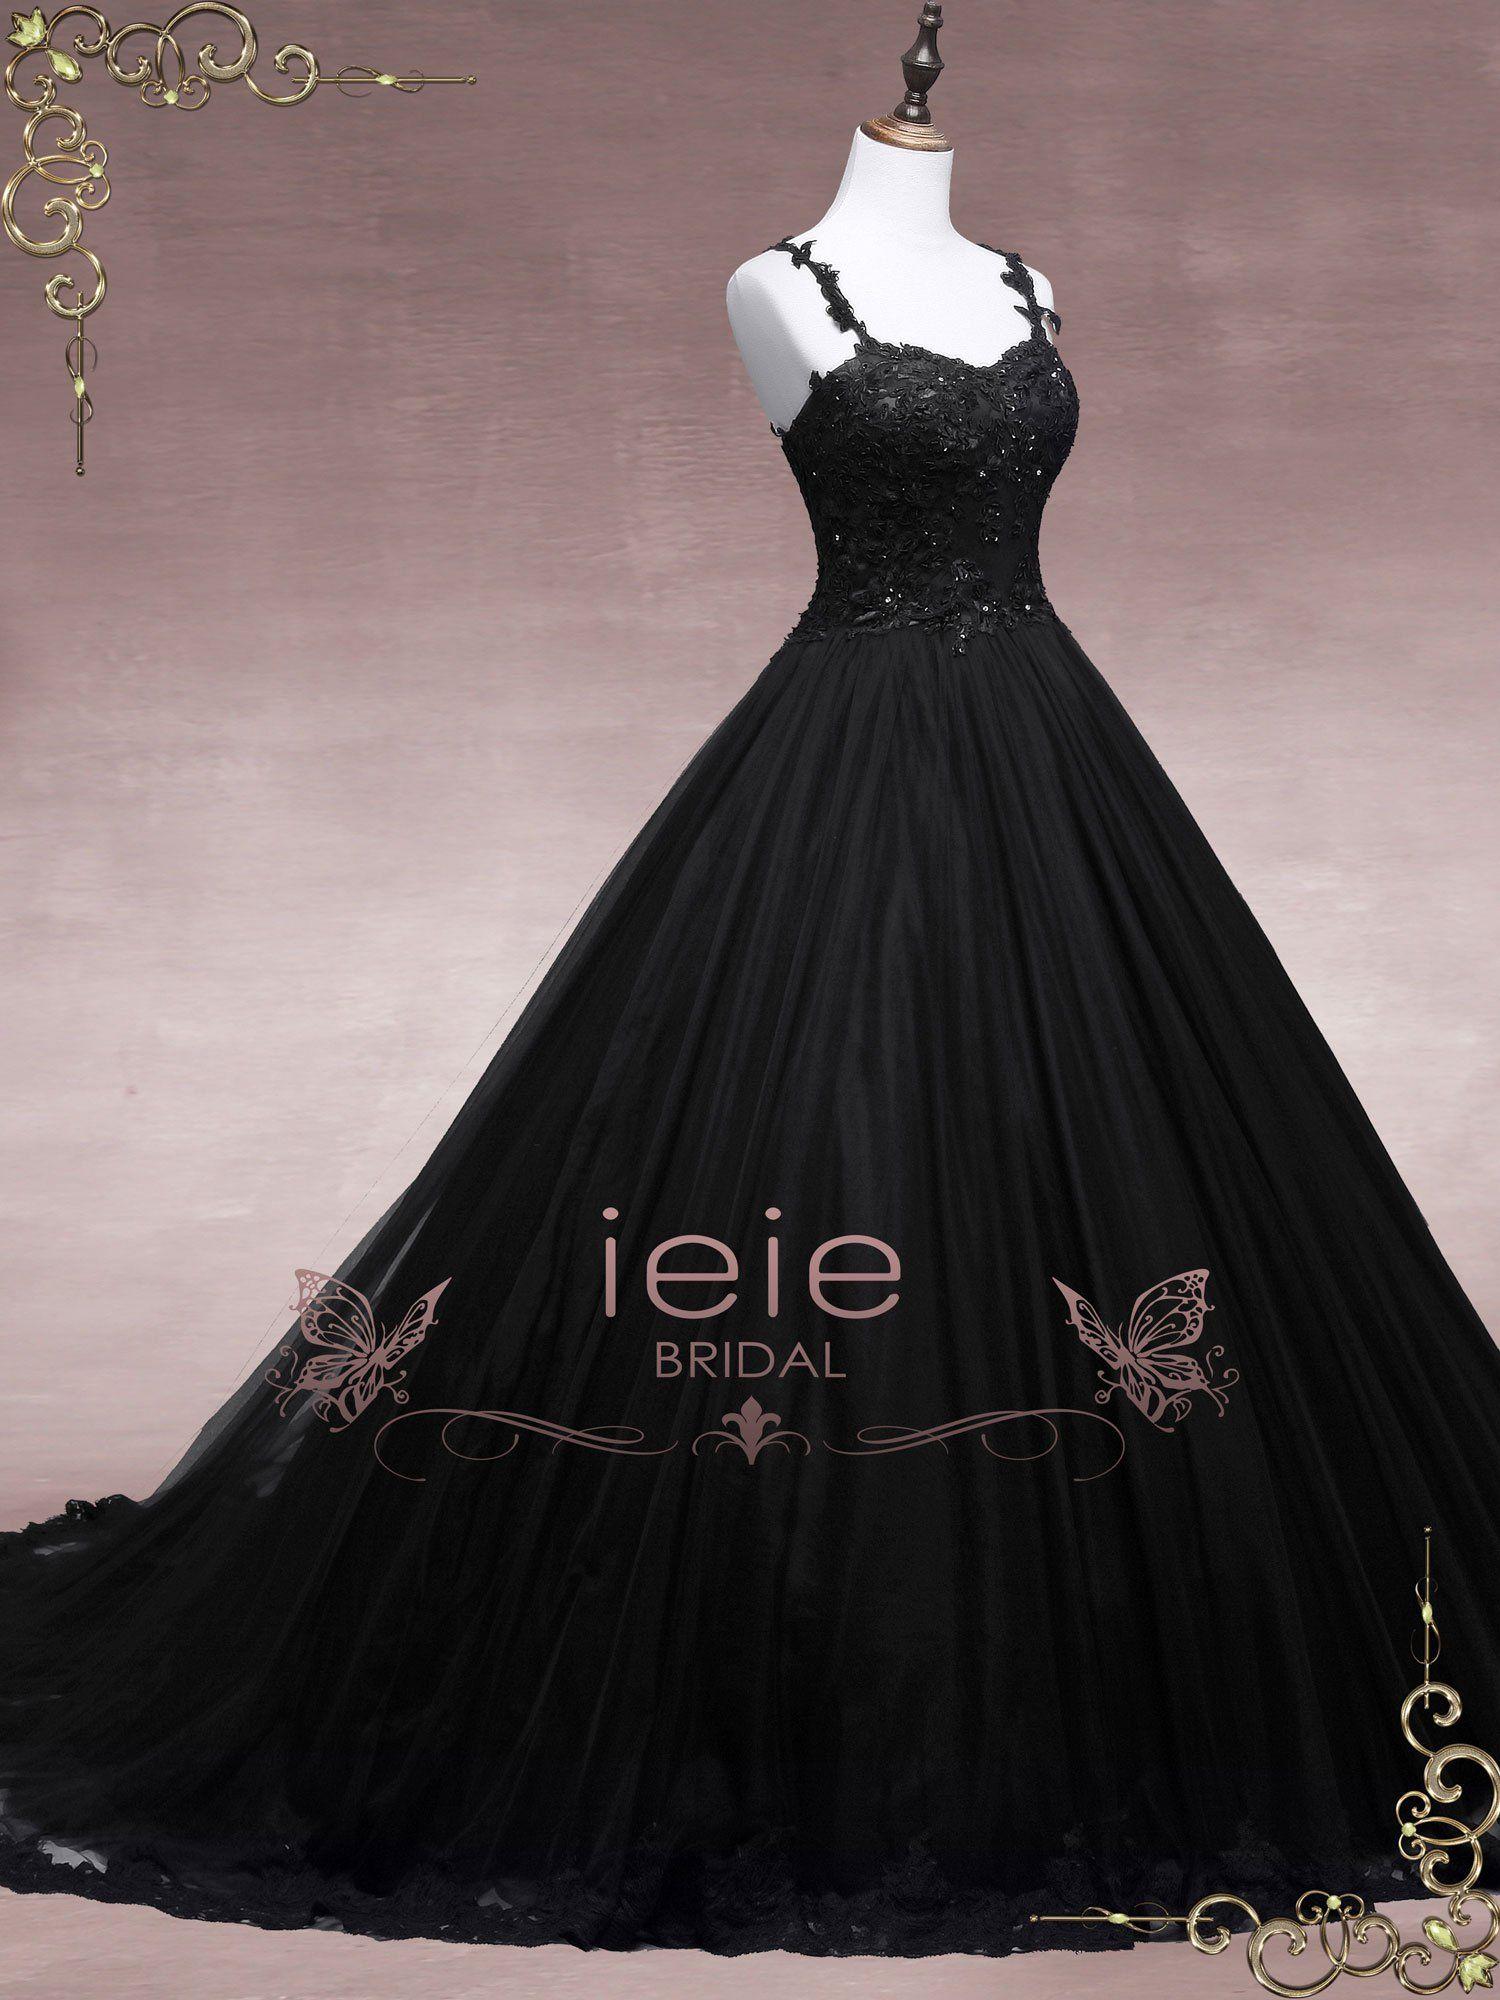 Black Lace Ball Gown Wedding Dress Black Wedding Dress Etsy Black Wedding Dresses Black Lace Ball Gown Untraditional Wedding Dress [ 2000 x 1500 Pixel ]